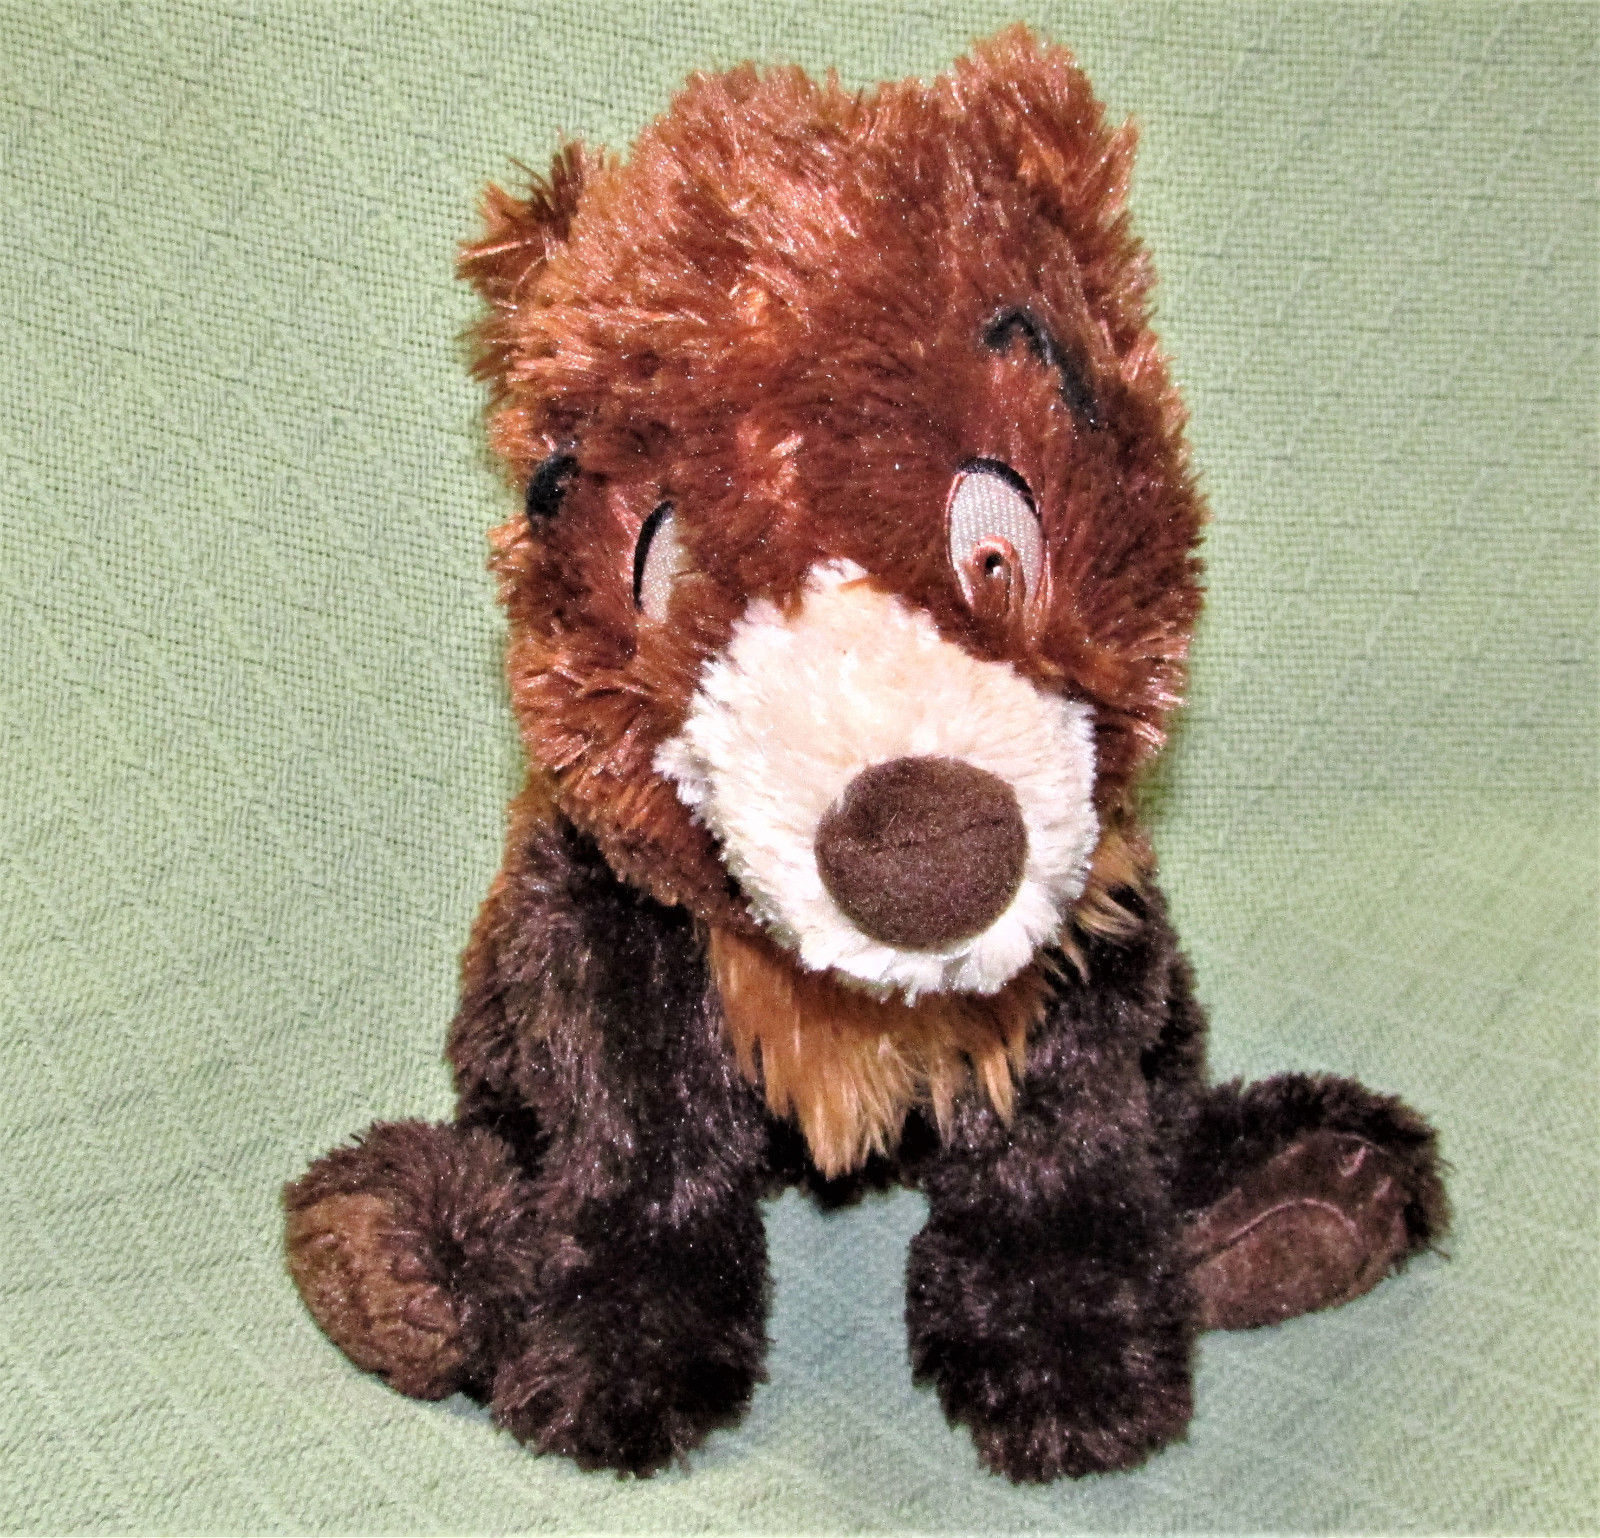 "Disney Brother Bear KODA Plush Brown Bear Floppy Bean Bag Stuffed Animal 12"" Toy image 3"